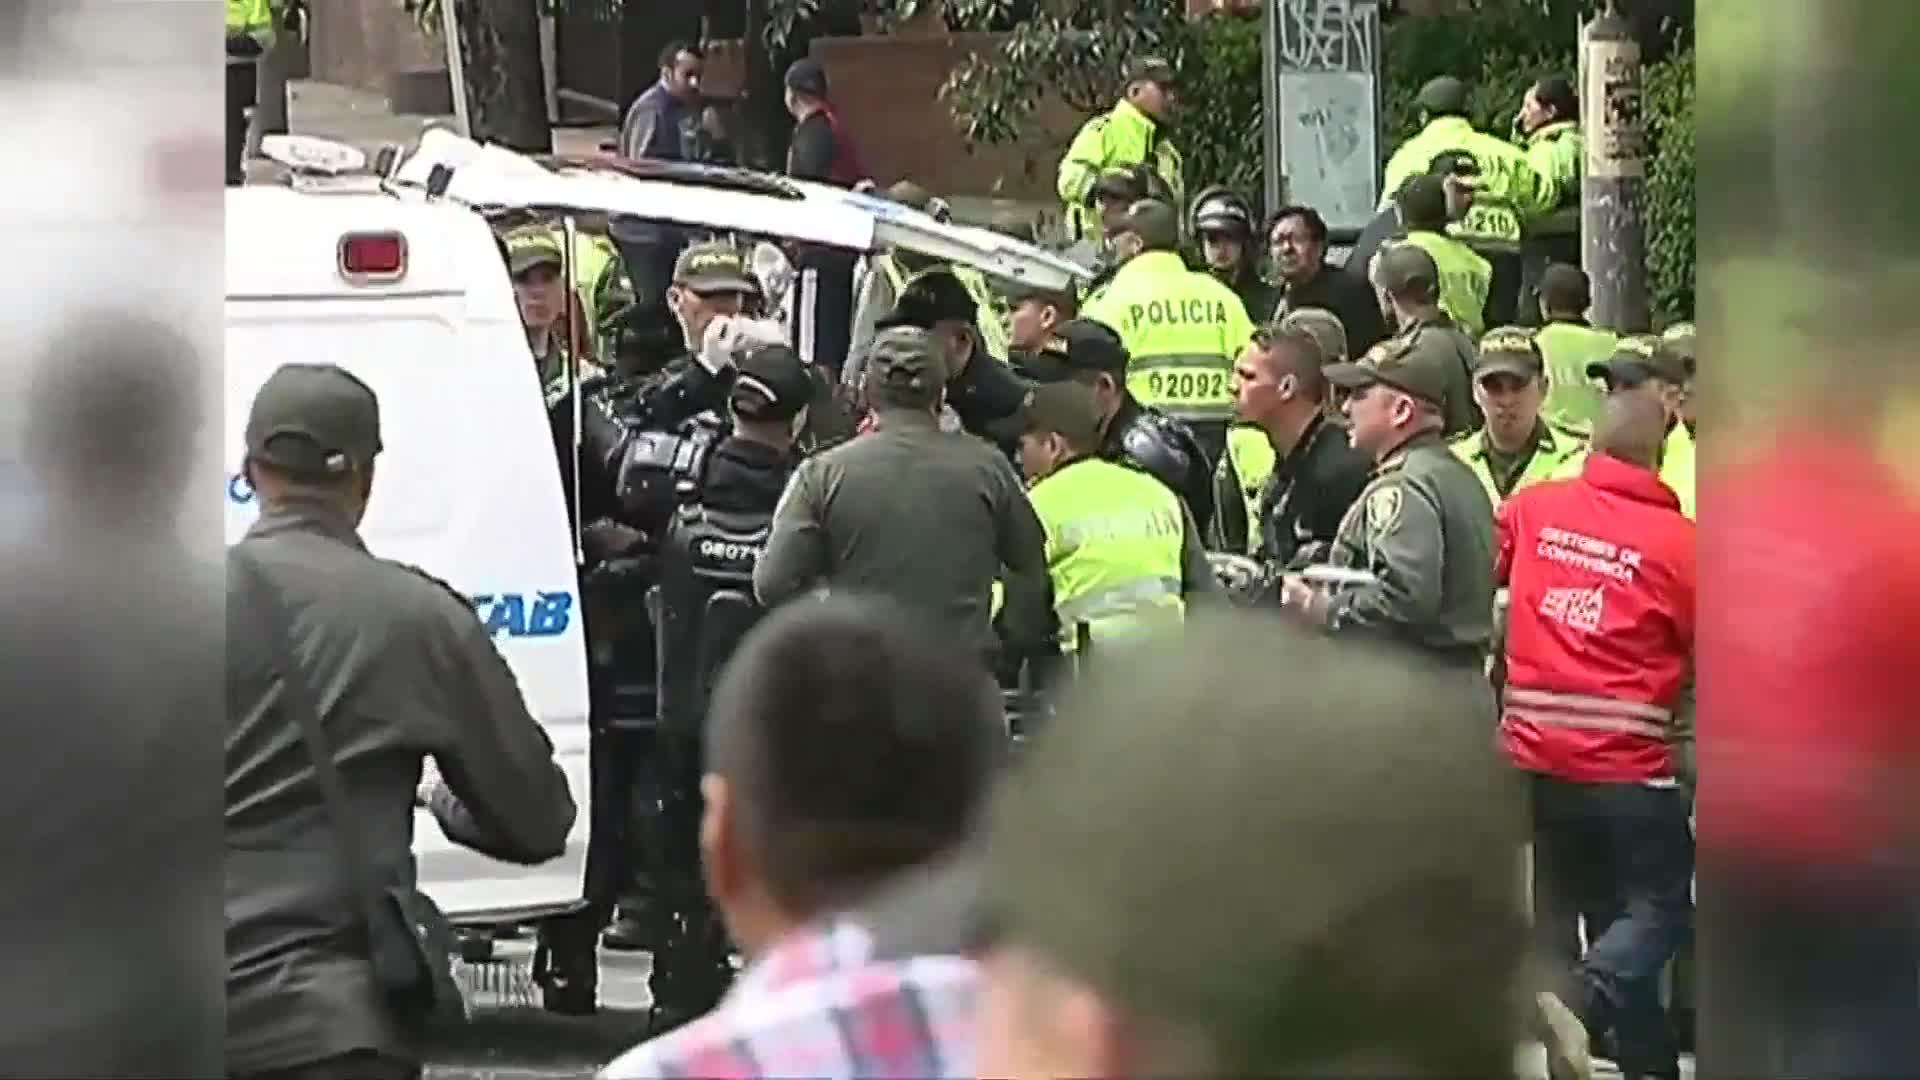 Explosion near Bogota bullring kills one, injures at least 30